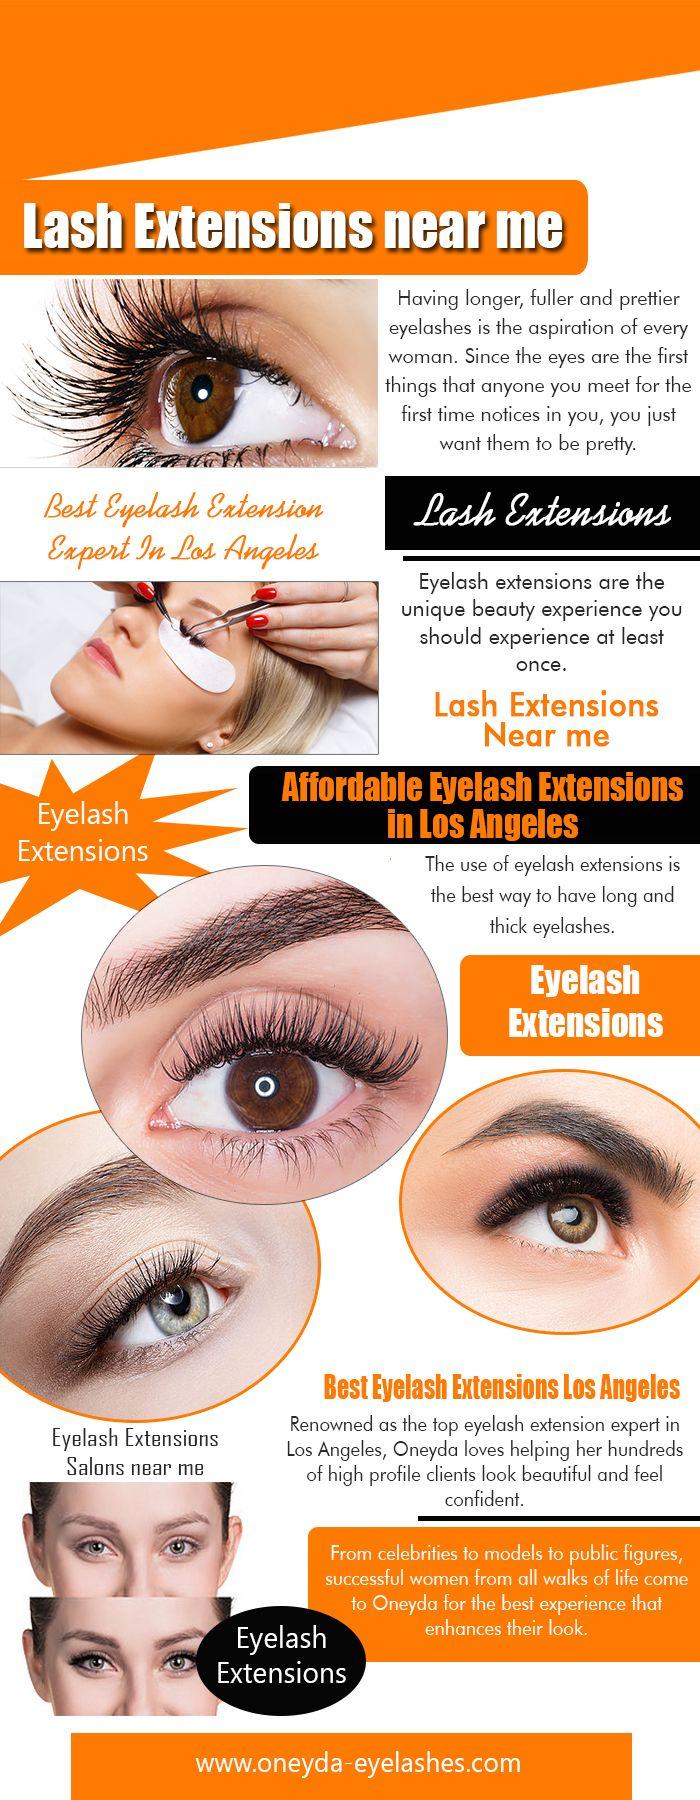 lash extensions (marcovvert) on Pinterest